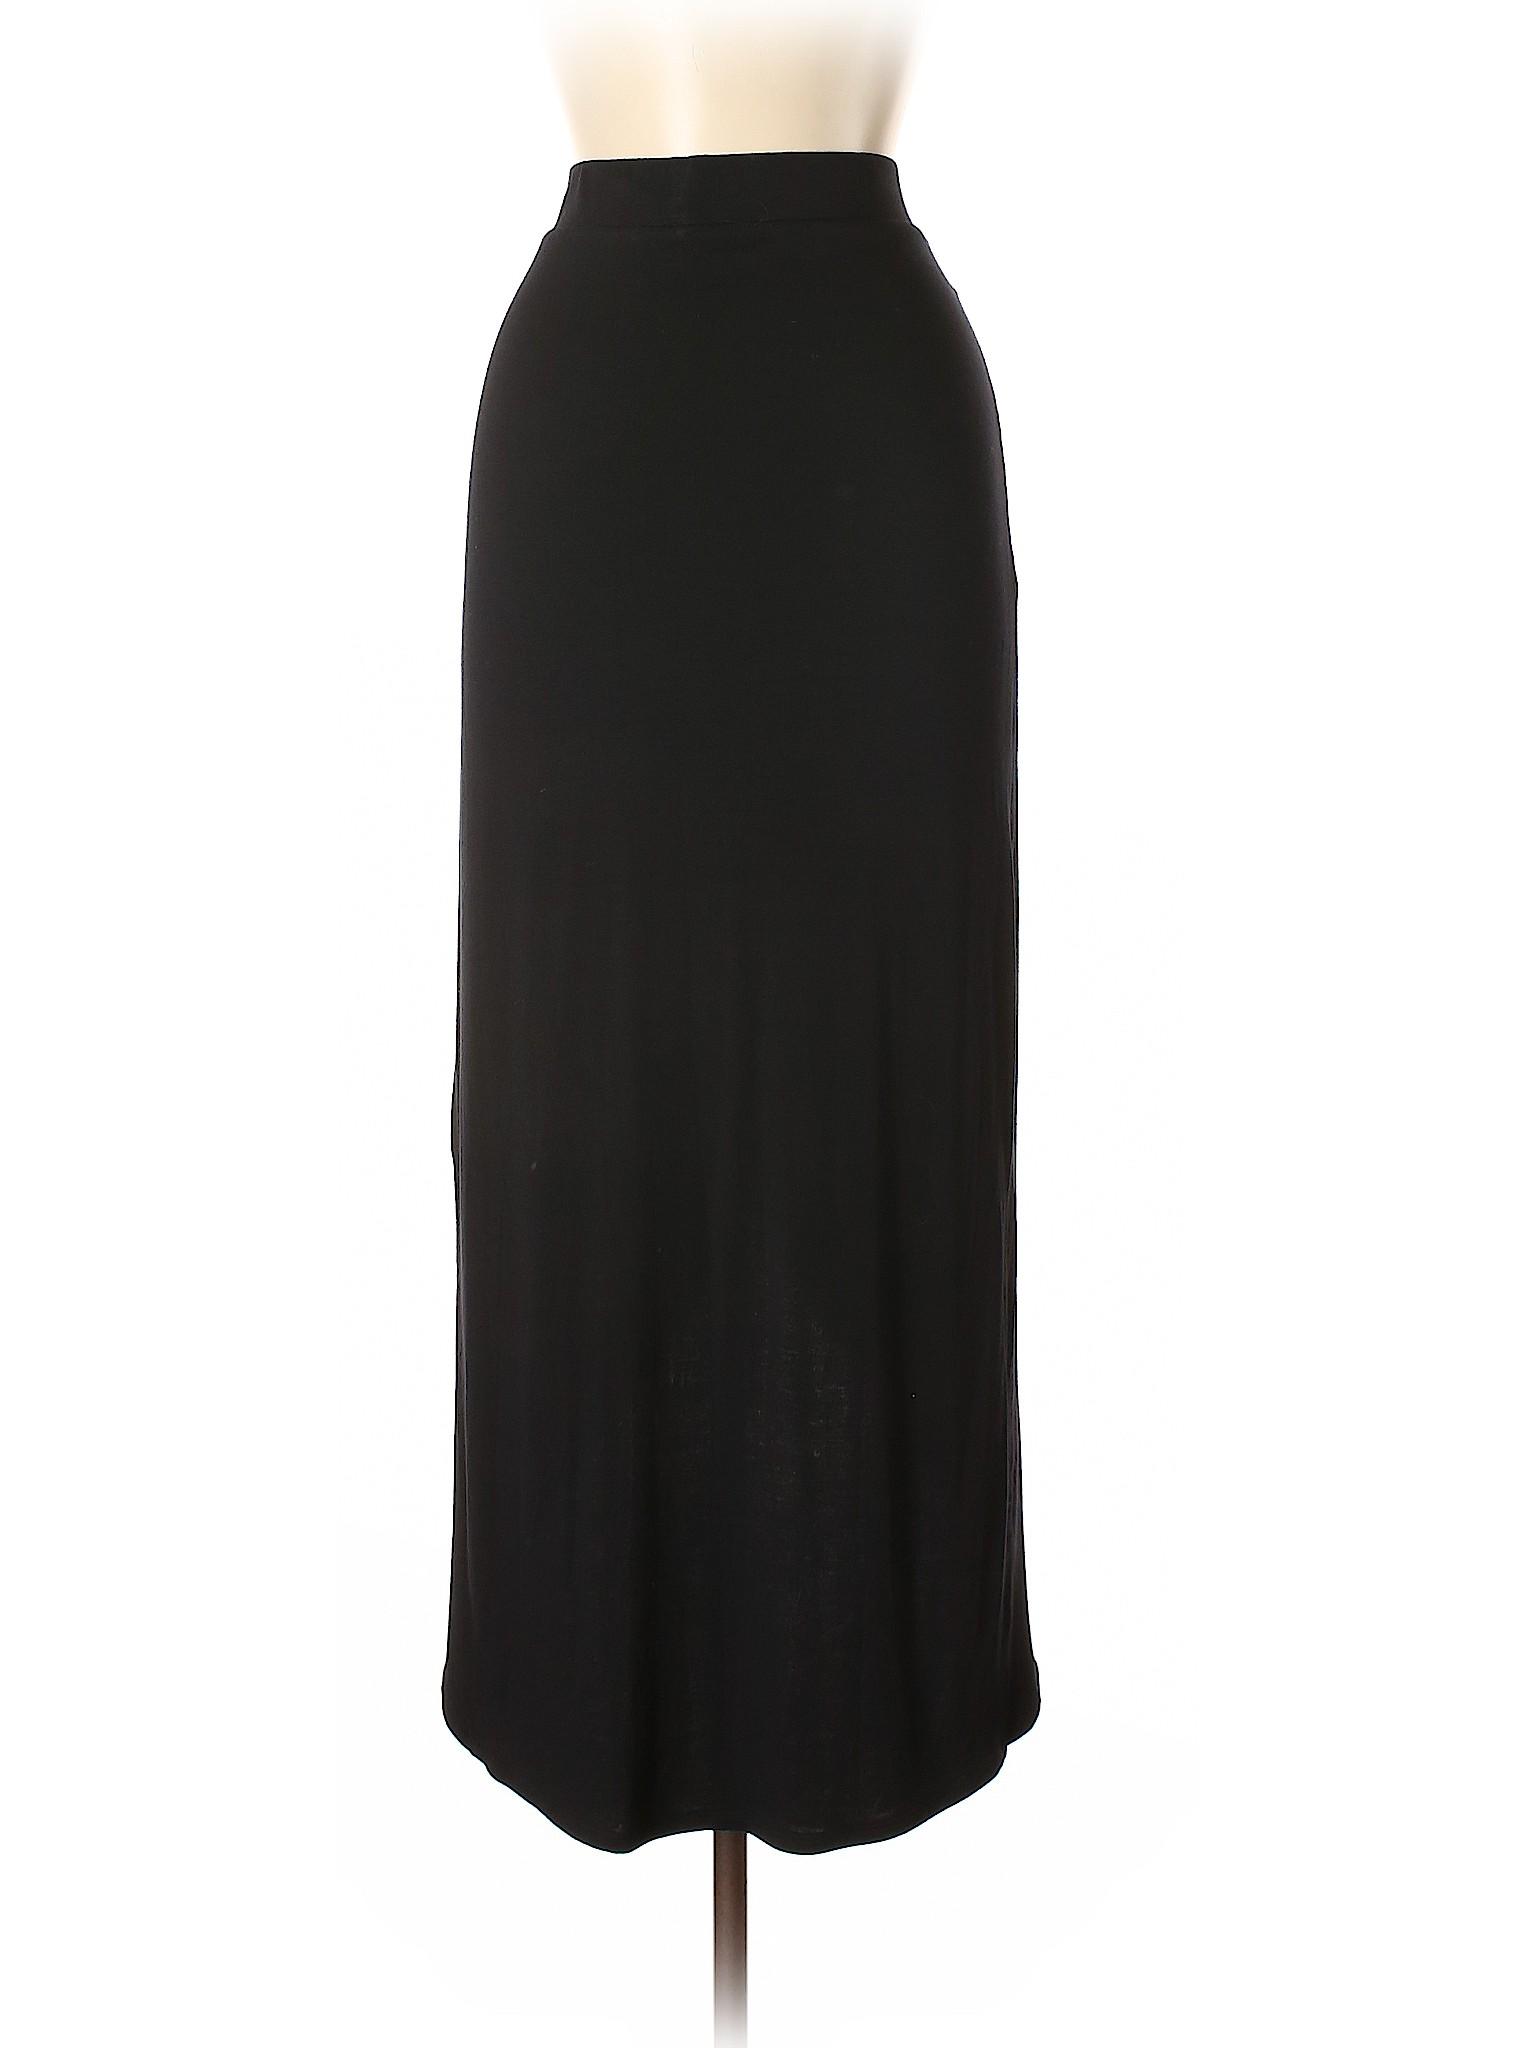 Boutique Casual Boutique Boutique Casual CAbi Skirt Skirt CAbi Skirt CAbi Casual anaYqrP